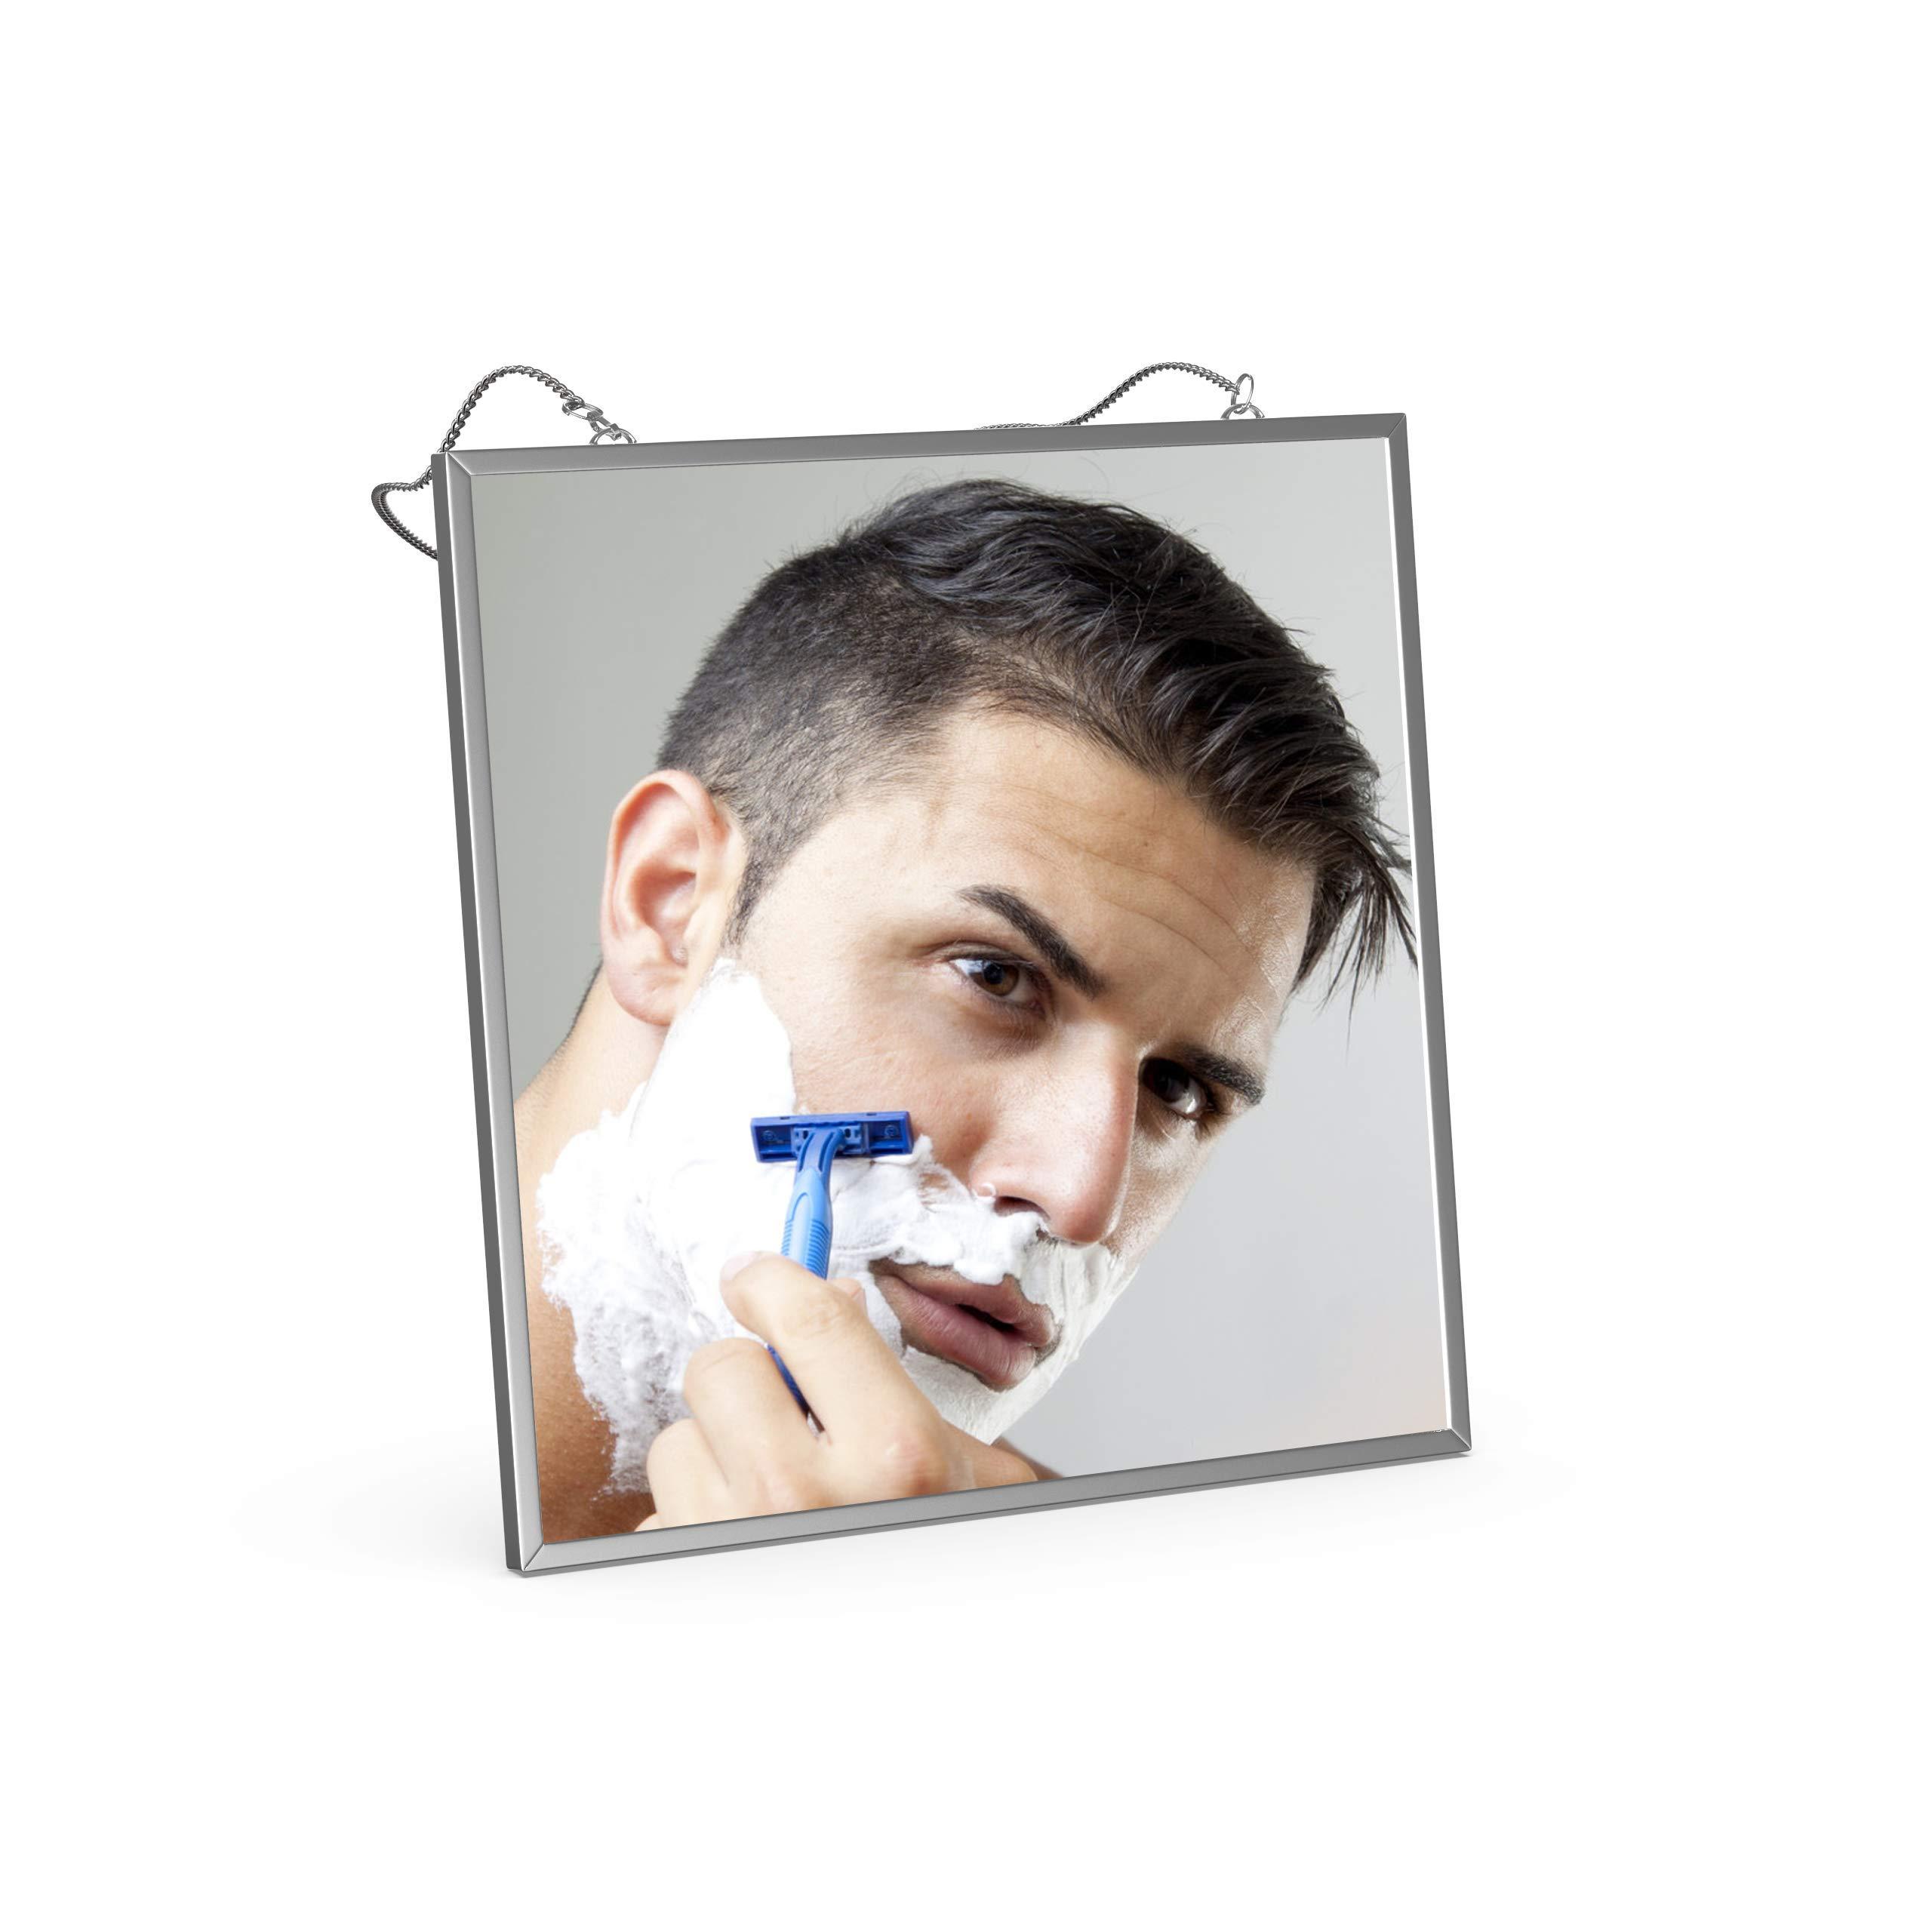 Fog Free Shower Mirror for Shaving, Liootech Anti-Fog Bathroom Fogless Shower Mirror large